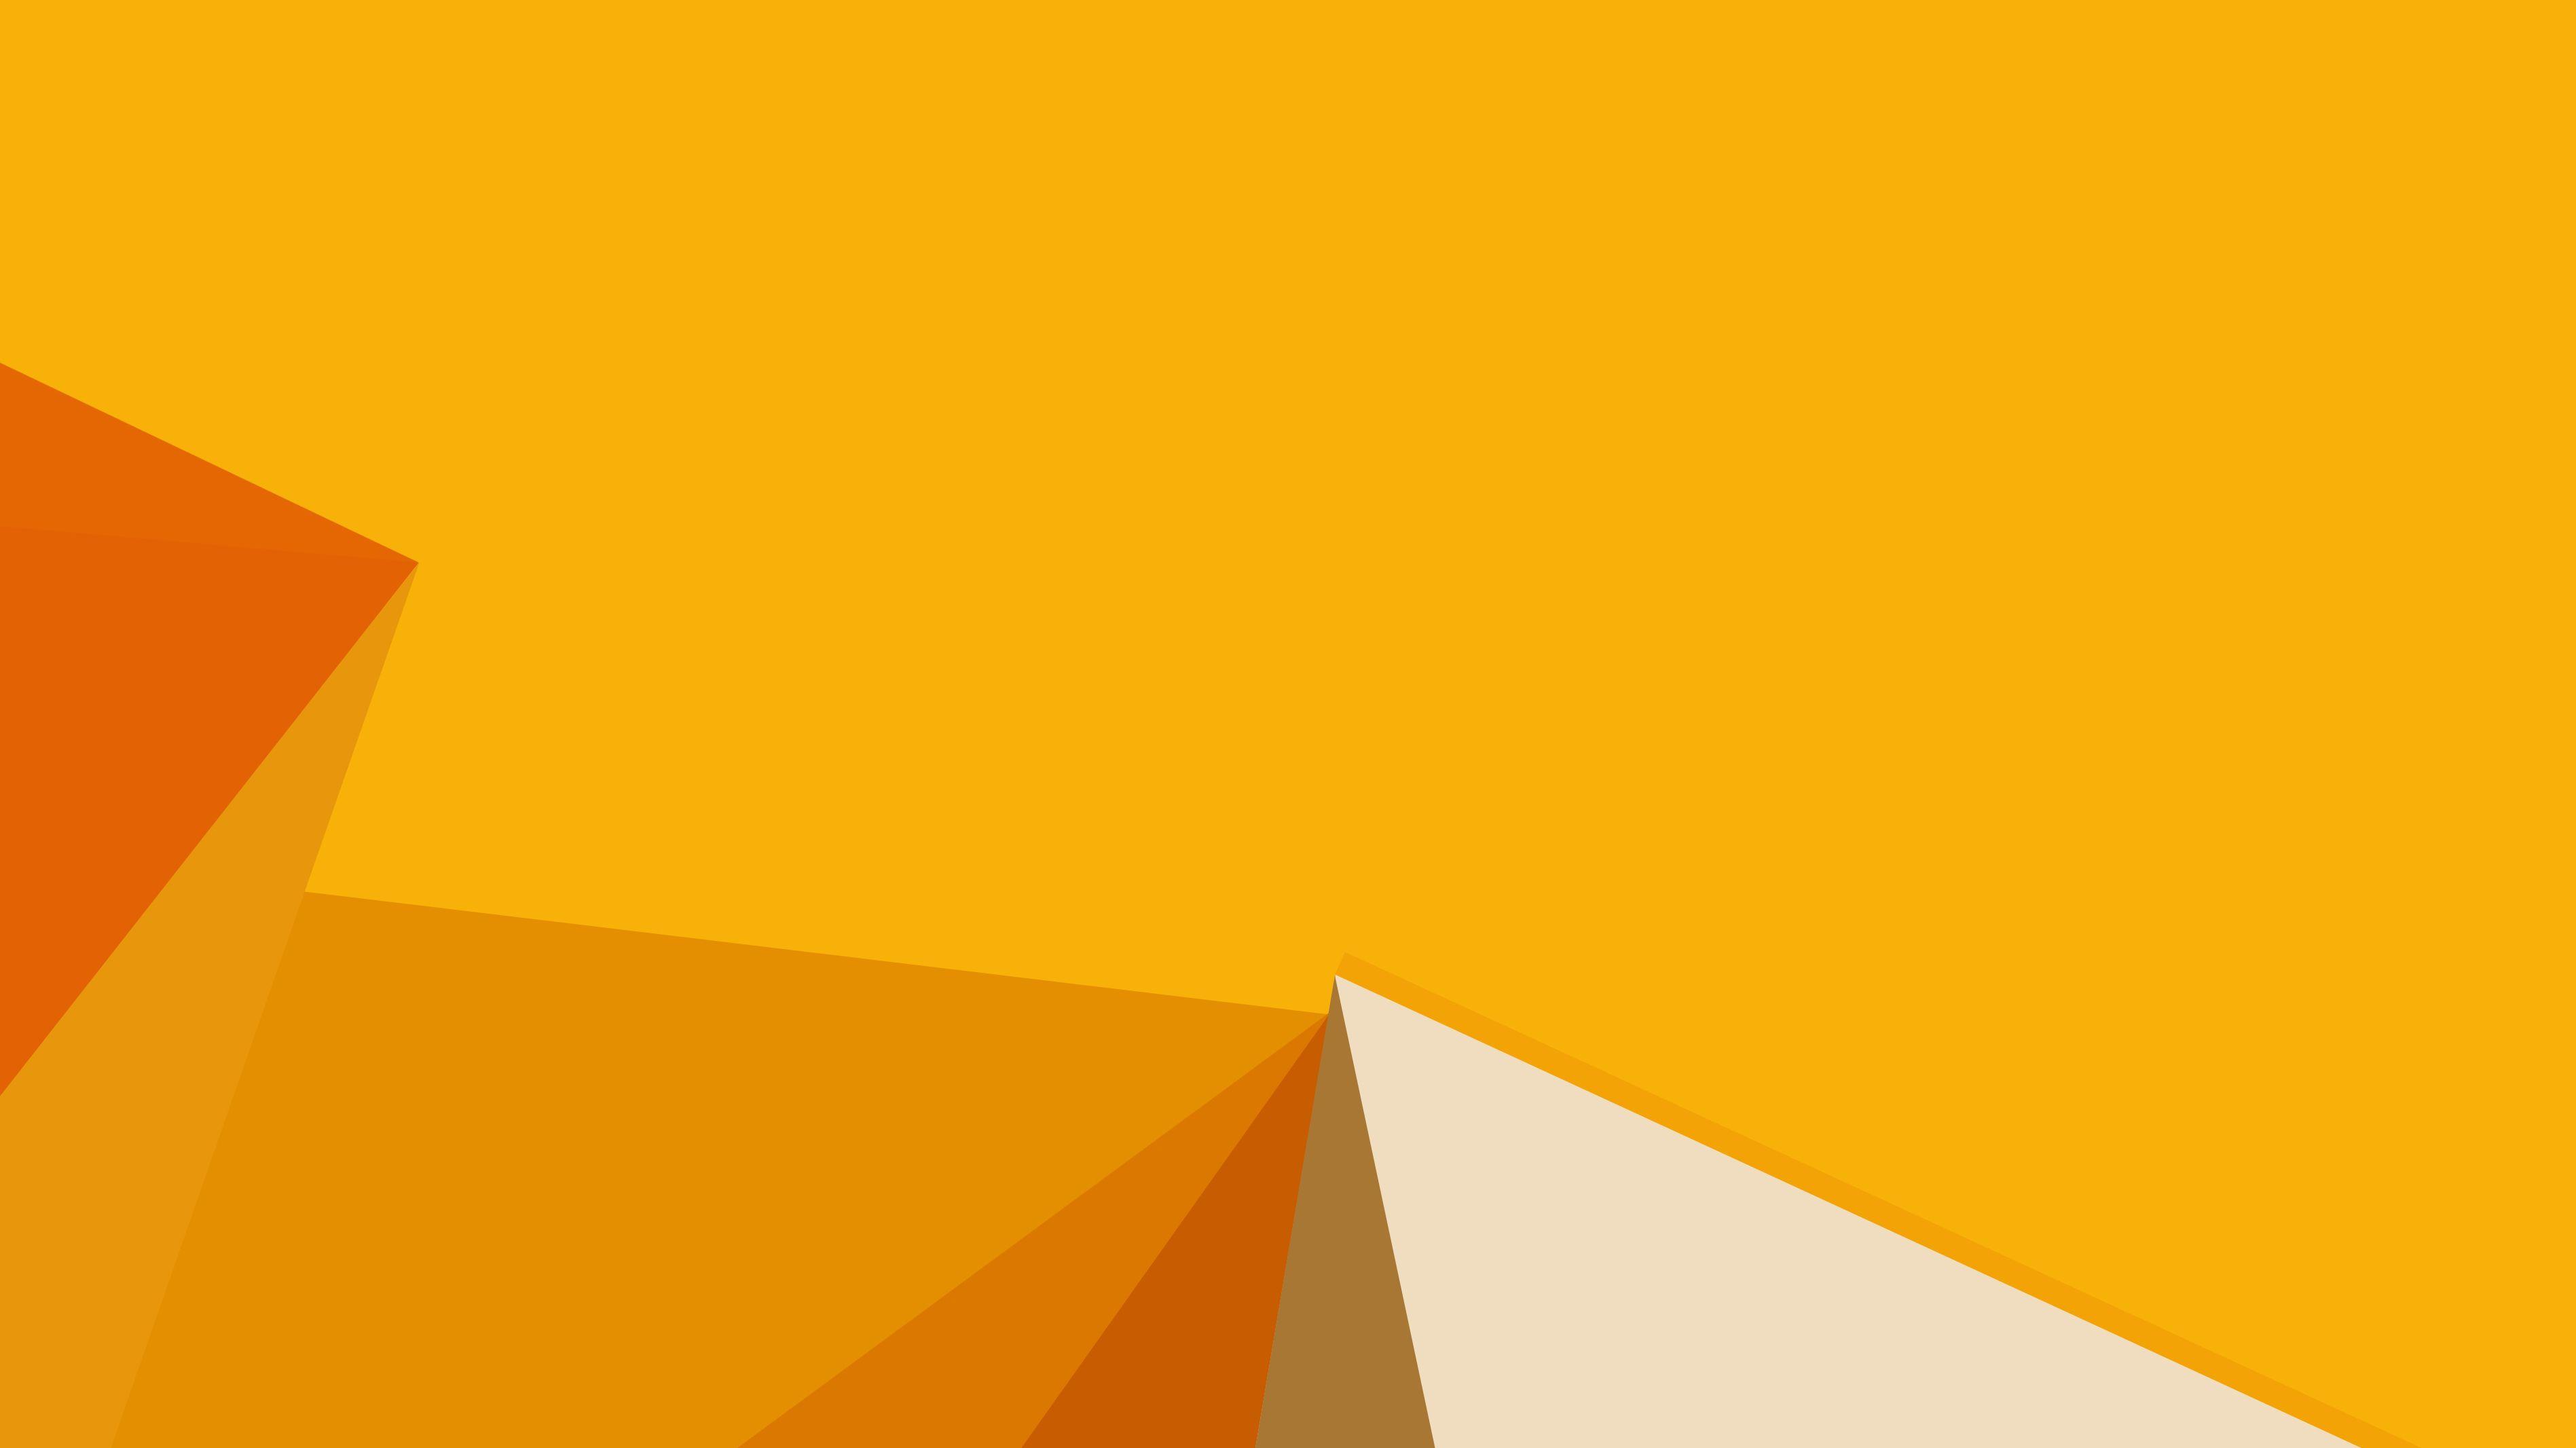 _minimal_flat__default_windows_8_1_wallpaper__4k__by